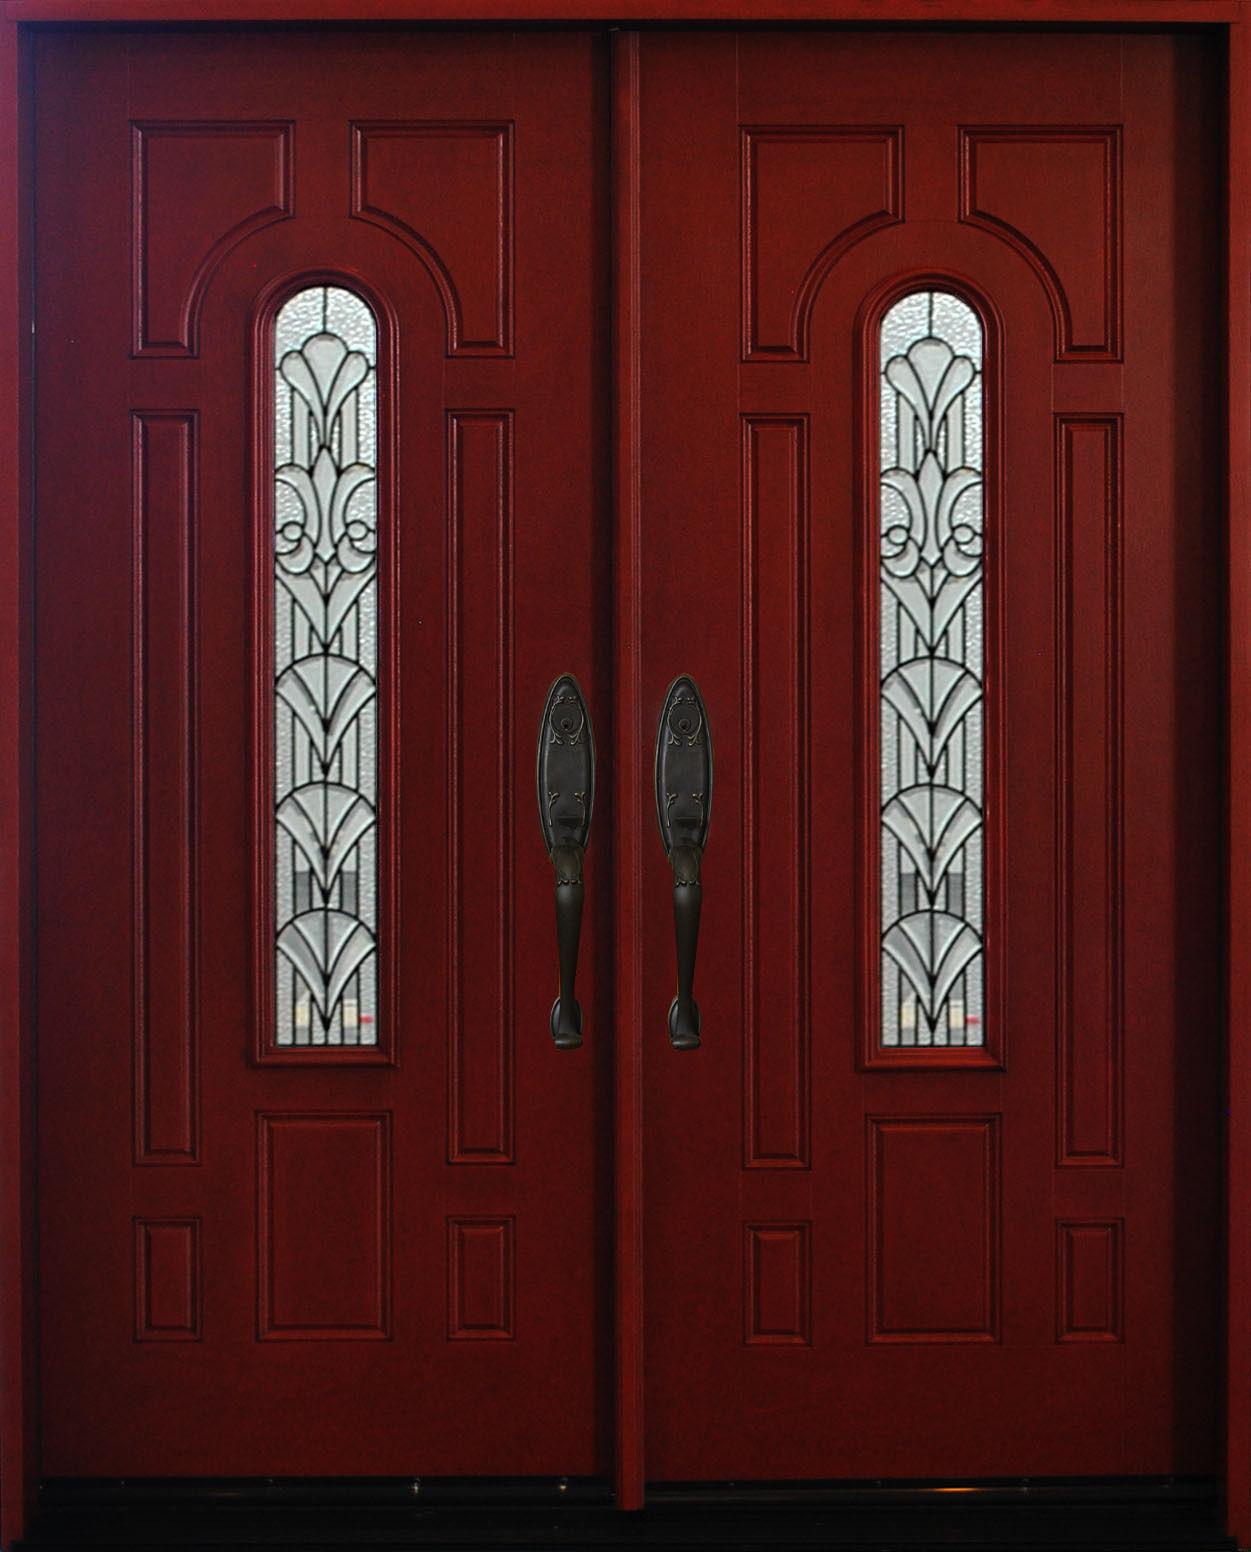 Exterior Front Entry Double House Fiberglass Door M280a 30 X 80 X2 Dbl Doors